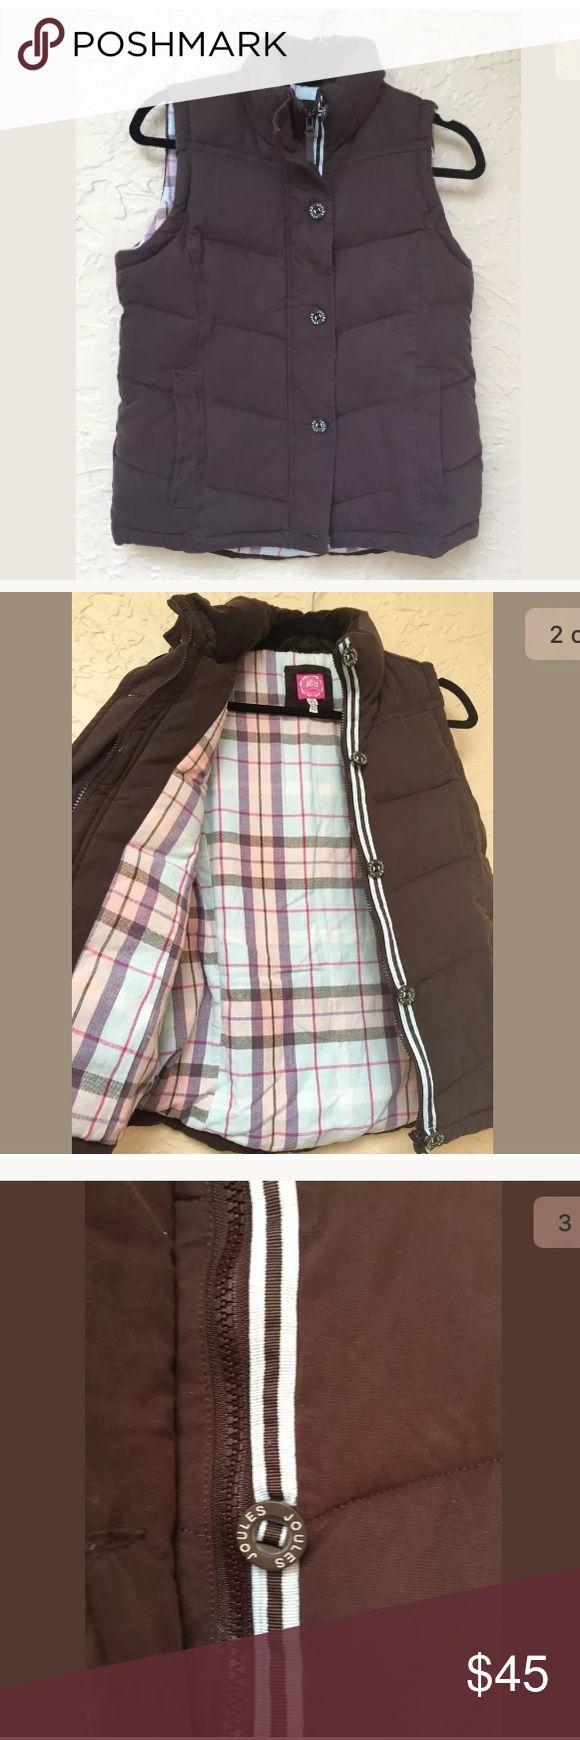 Joules quilted outdoor vest size 6 brown Super cute outdoor vest jacket brown size 6 feels amazing Joules Jackets & Coats Vests